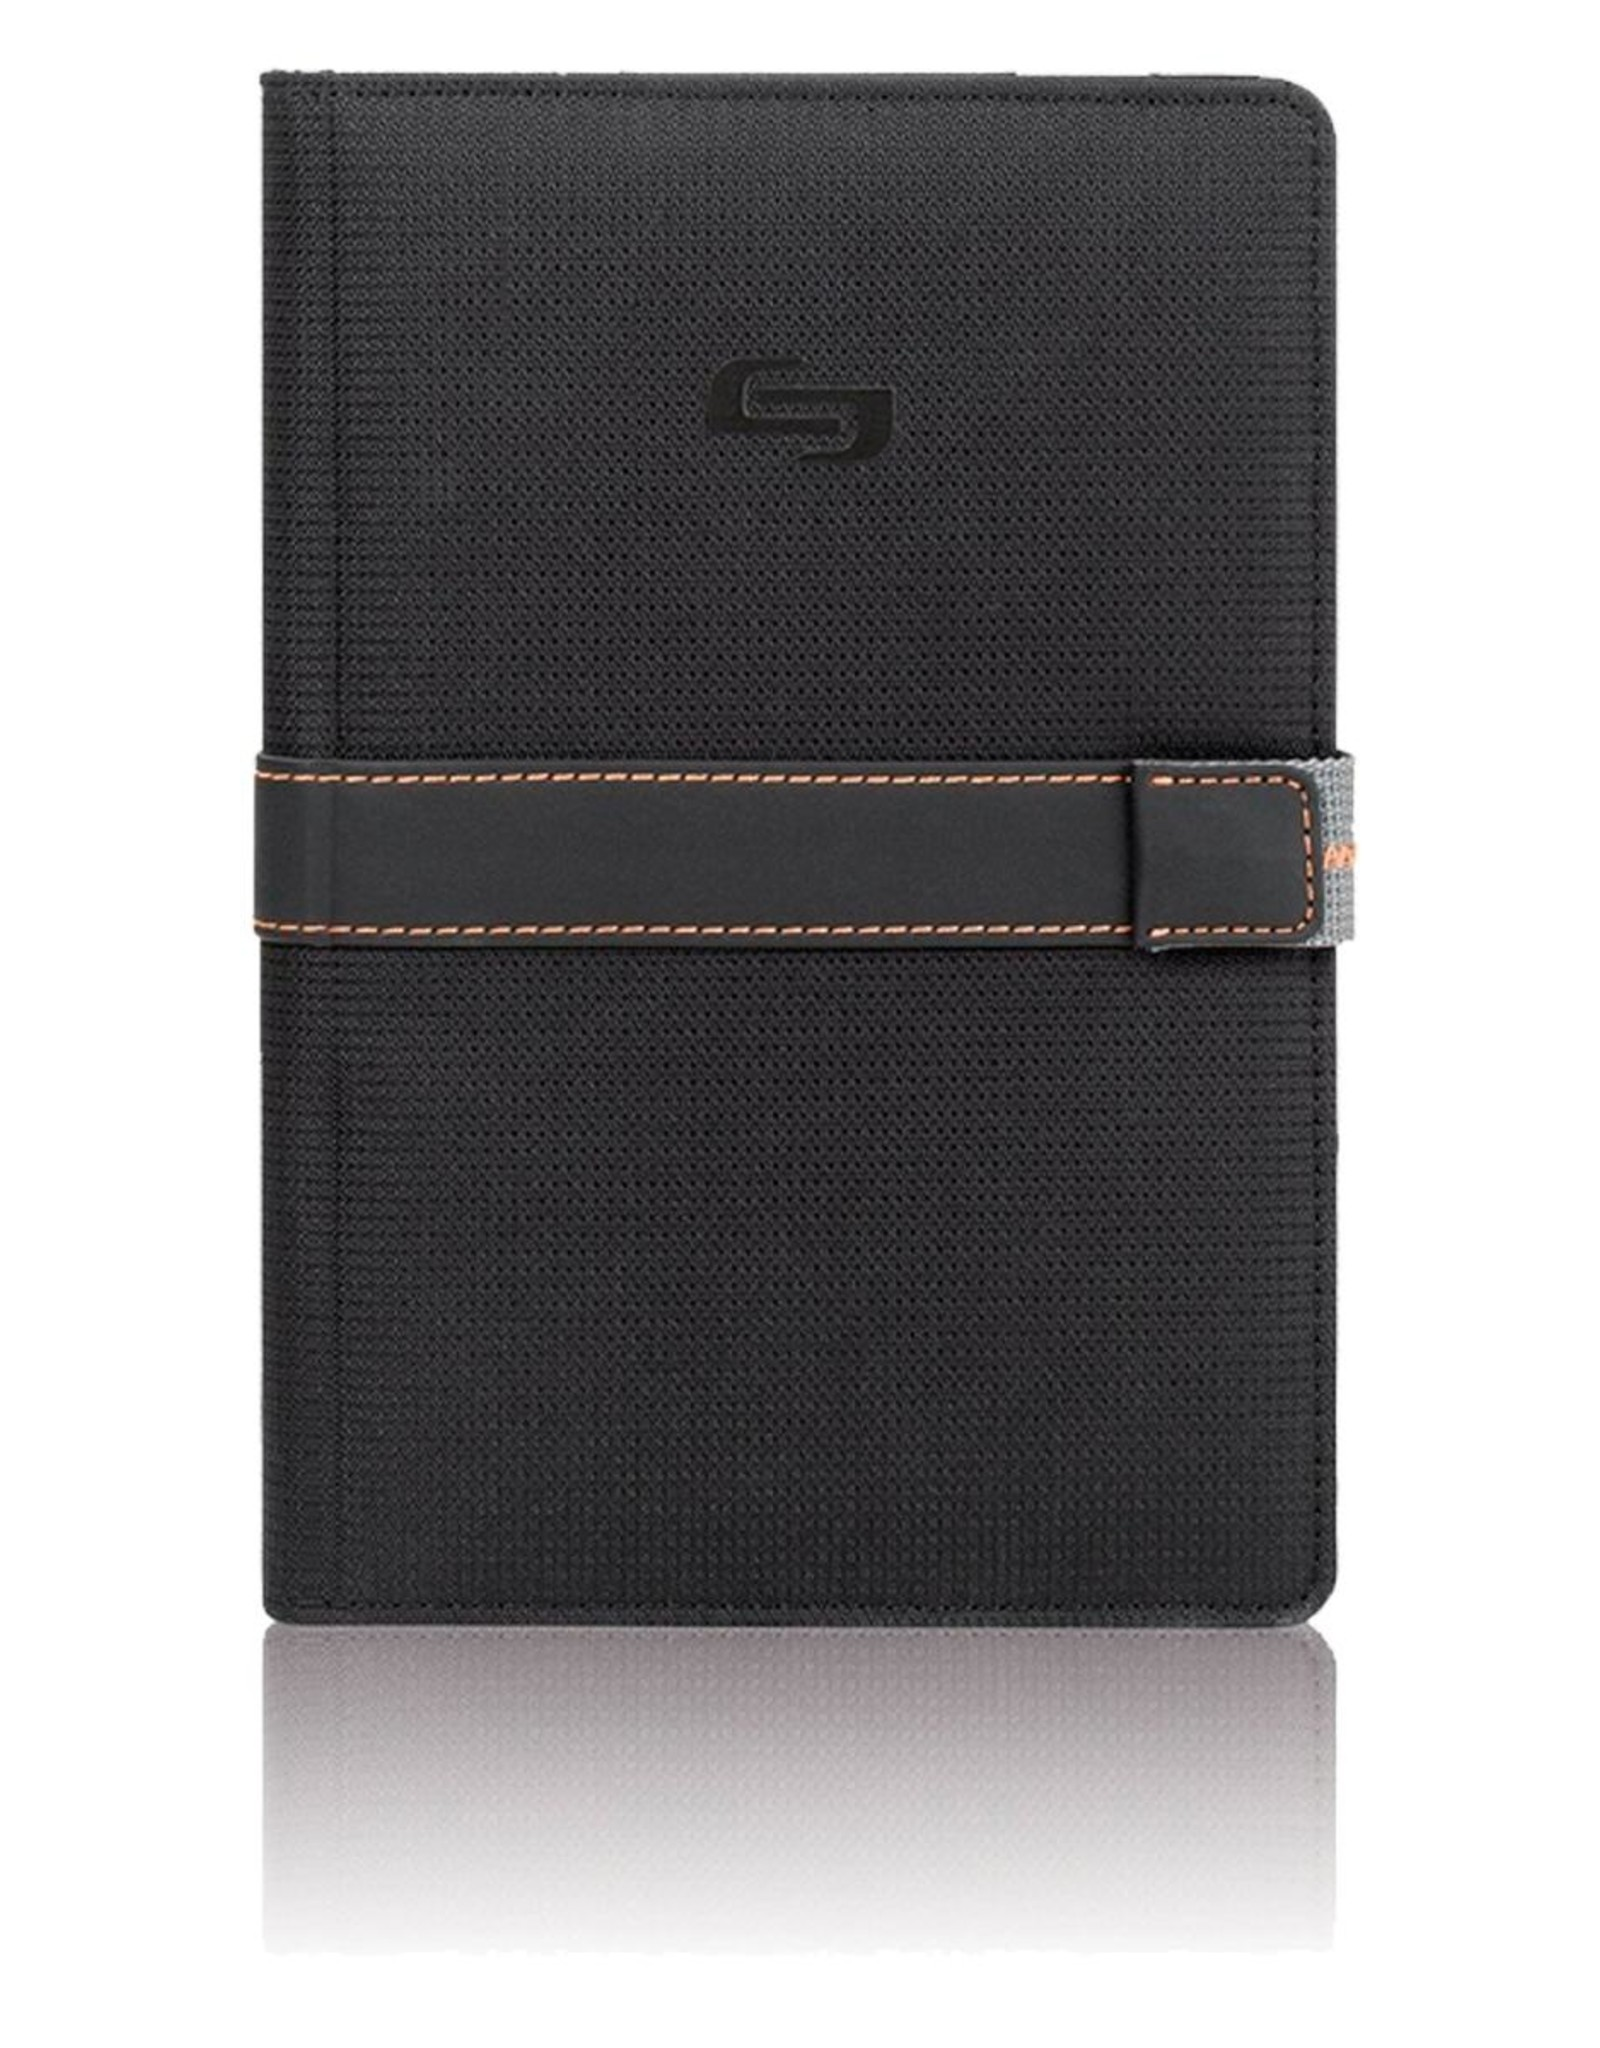 Solo Urban Universal Fit Tablet/eReader Case 5192672